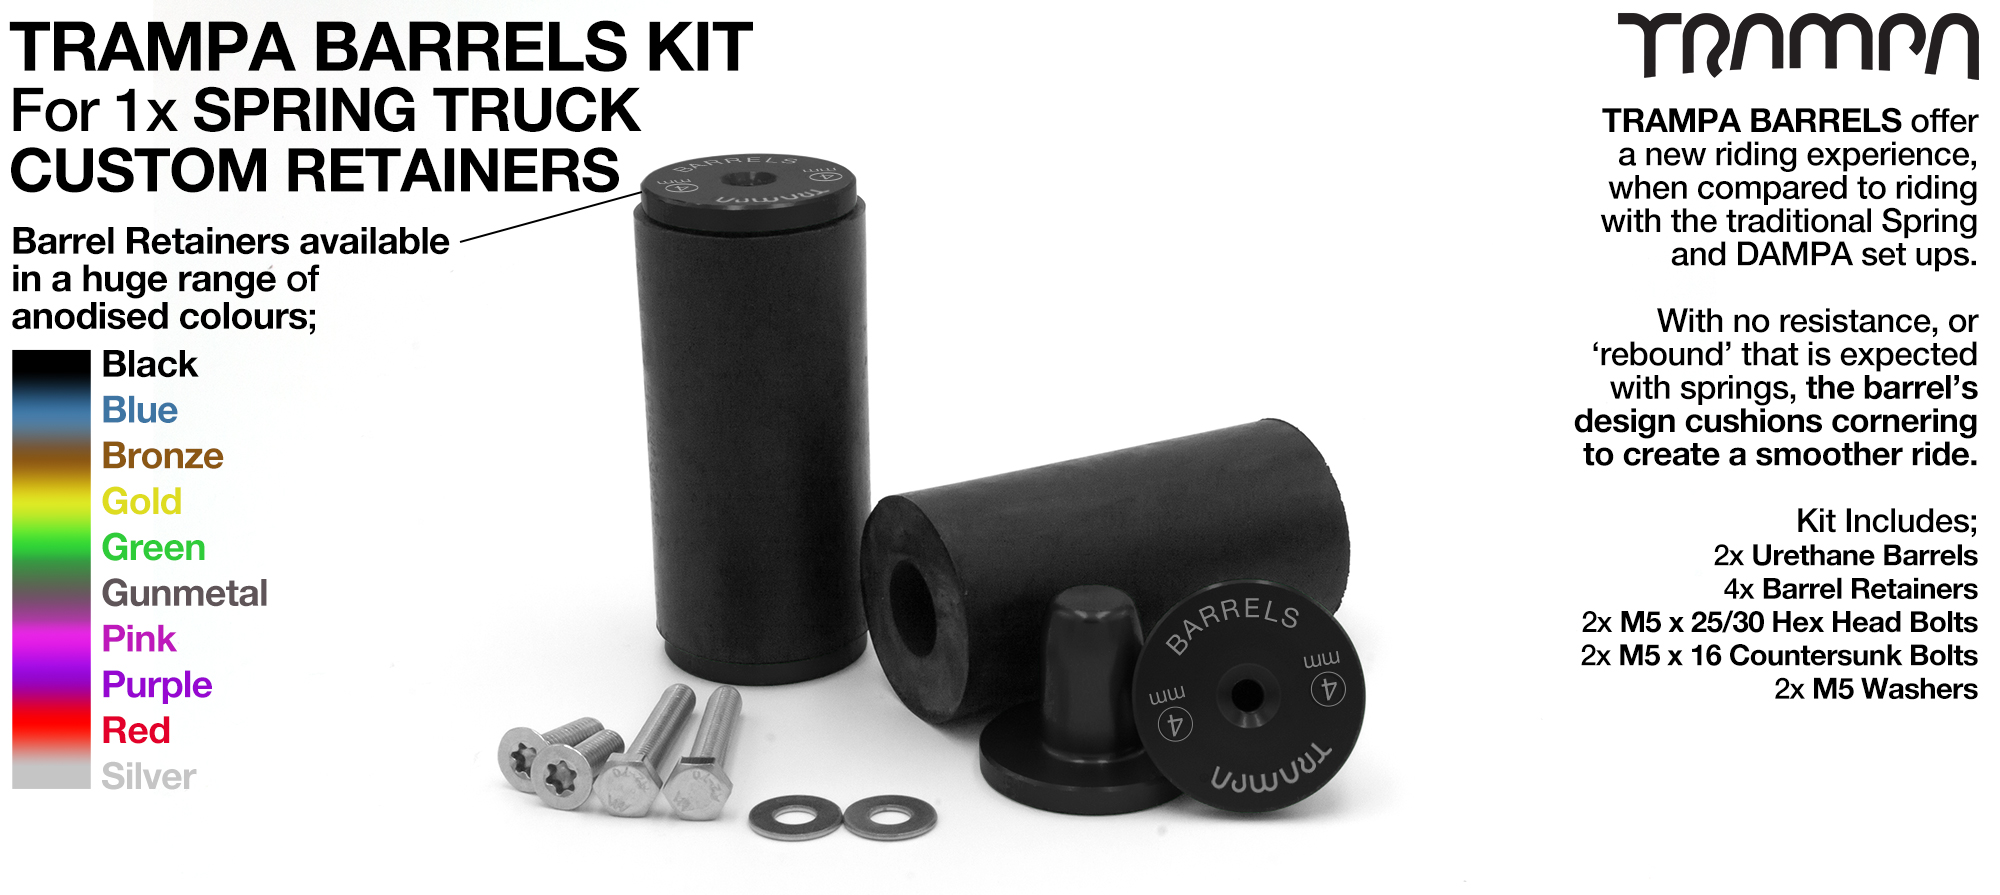 TRAMPA BARRELS Complete TRUCK Kit